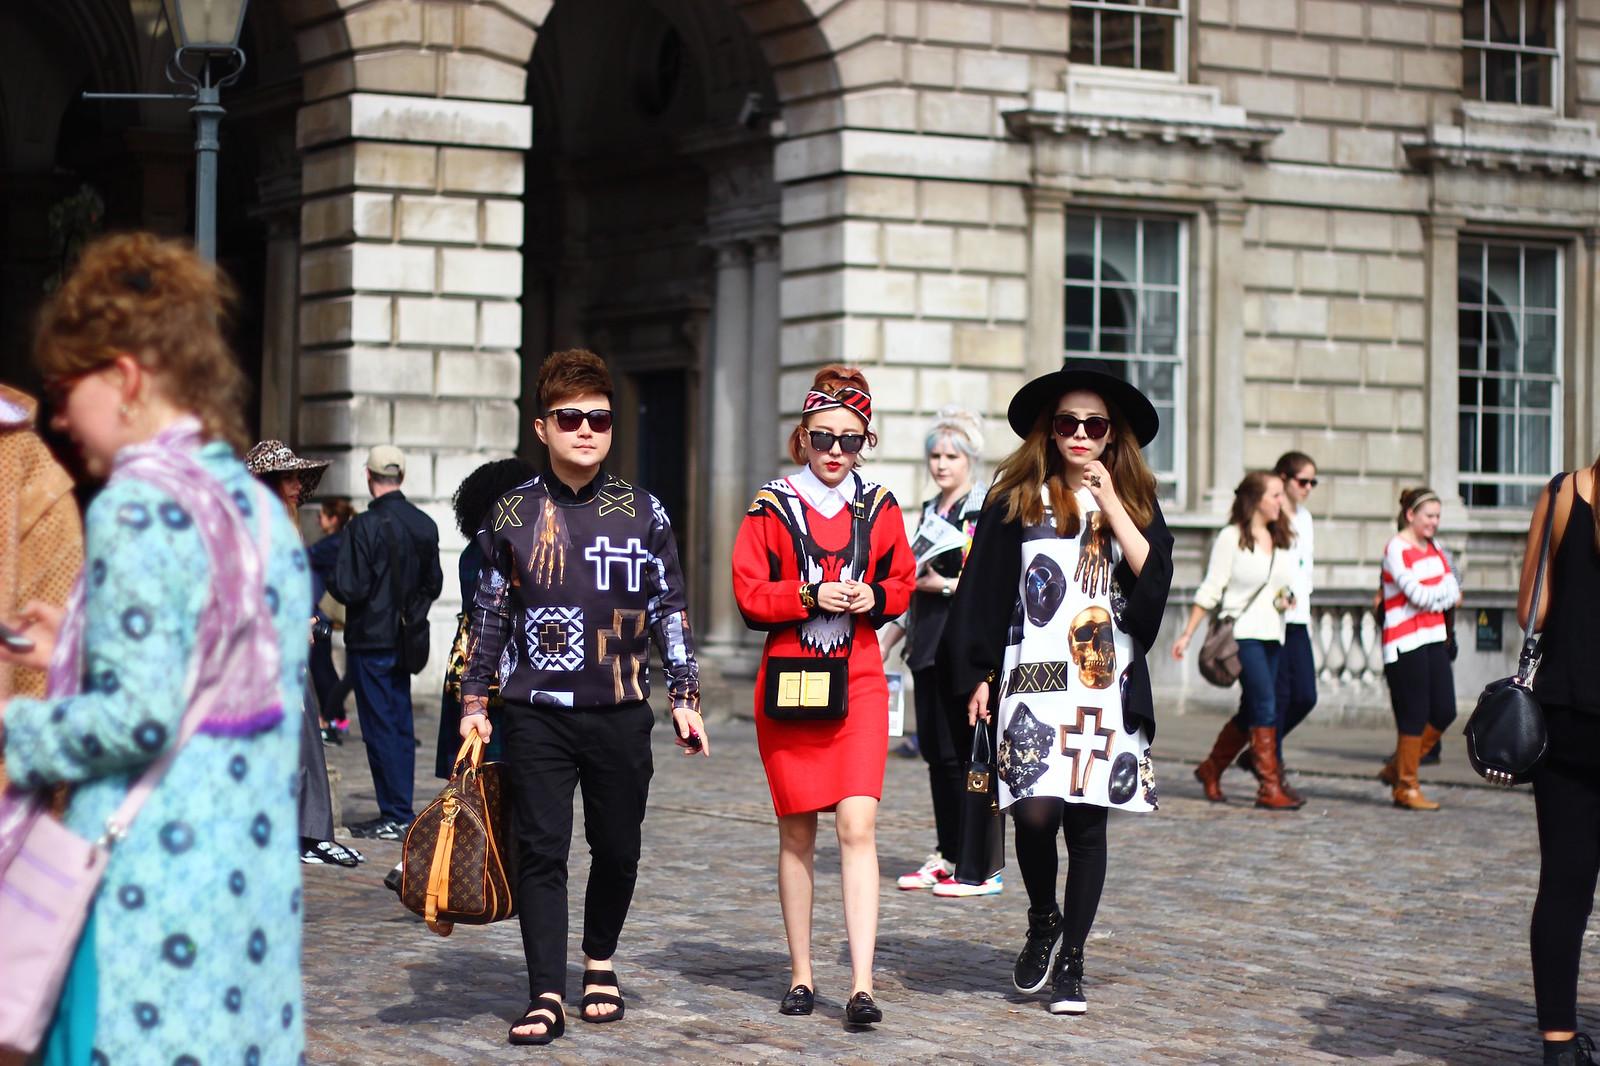 2lfw, londonfashionweek, streetstyle, photography